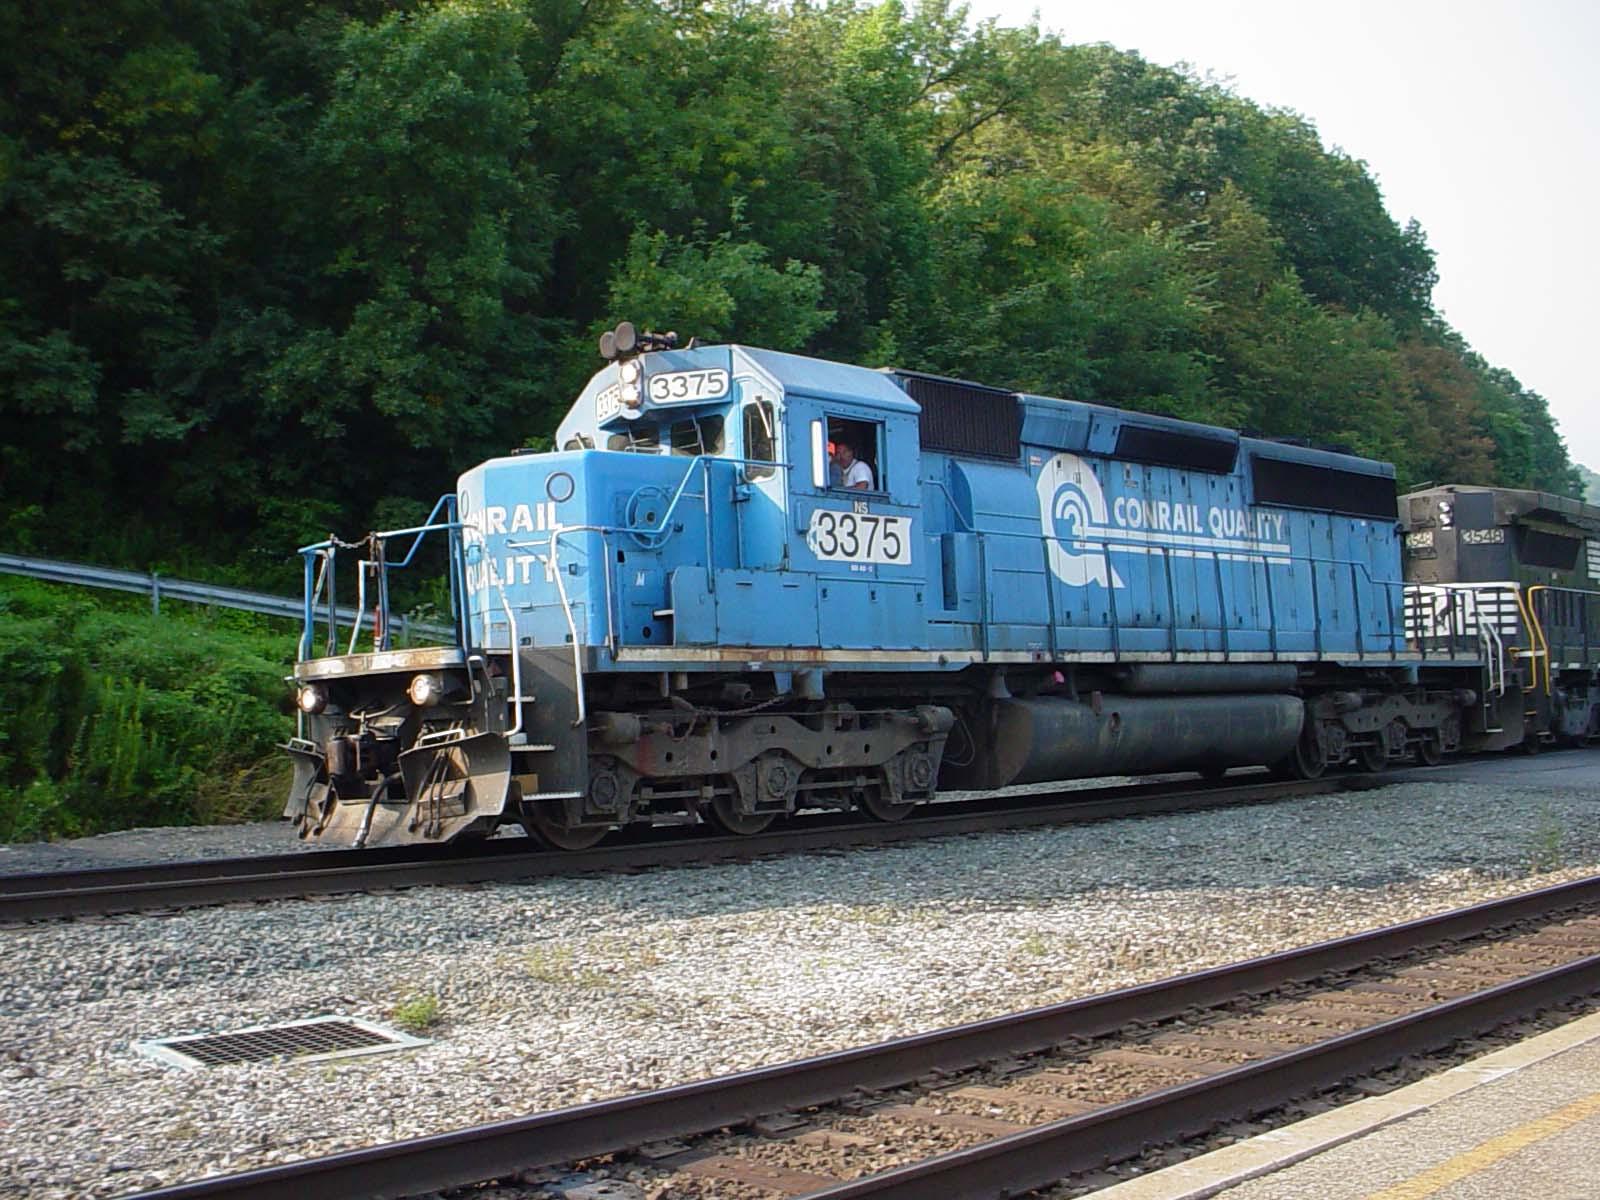 NS 3375